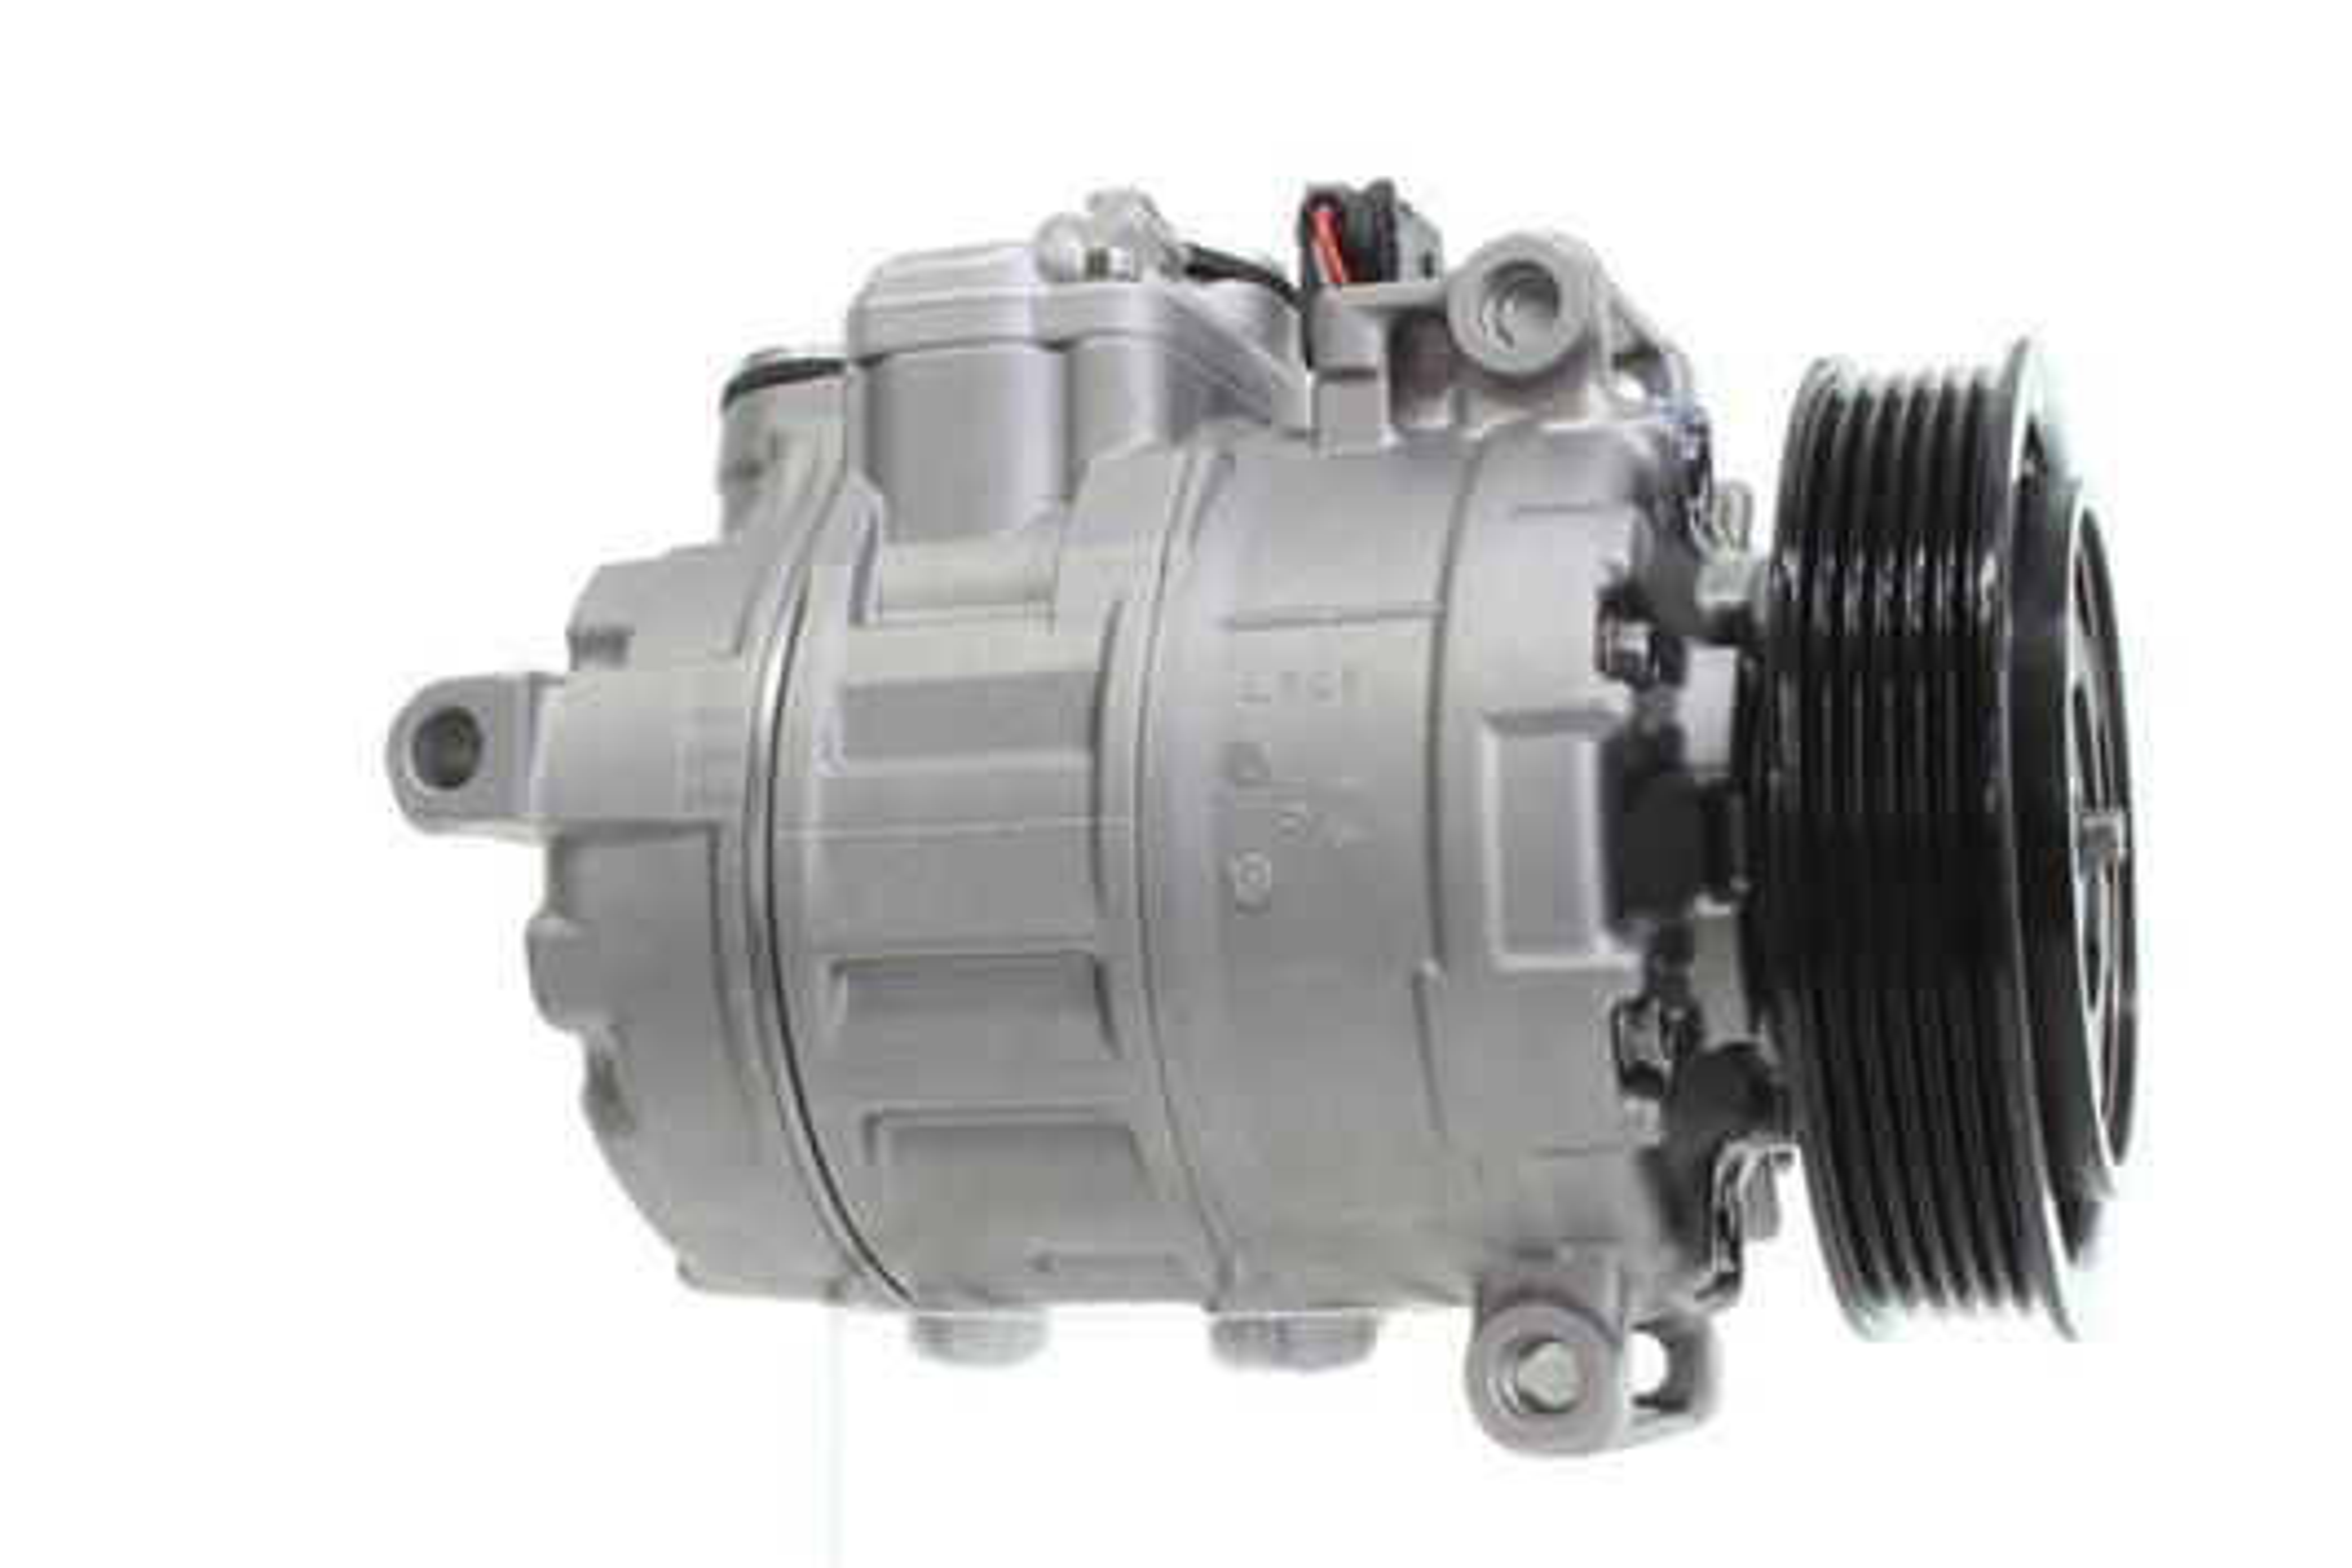 10550945 Klimaanlage Kompressor ALANKO - Markenprodukte billig